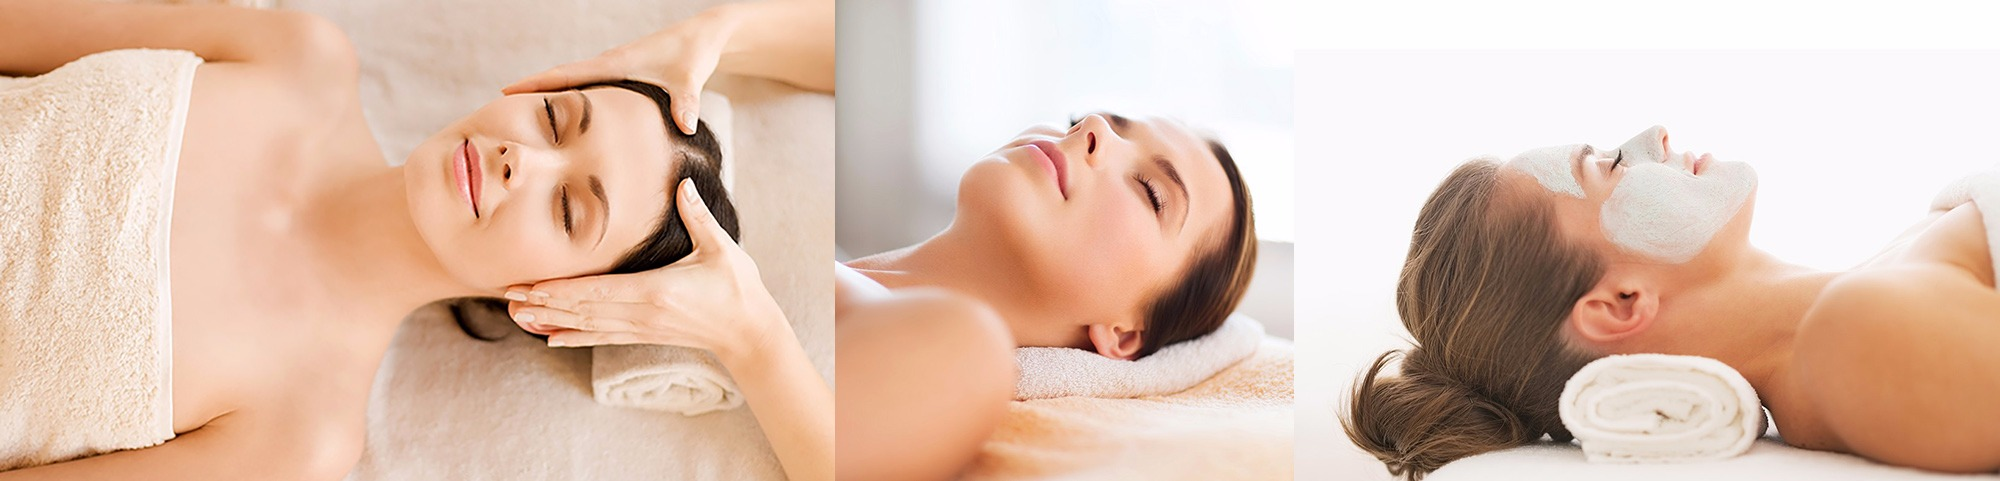 Rejuvenating Joyce Blok Facials and the full Joyce Blok Skincare Range available in salon.